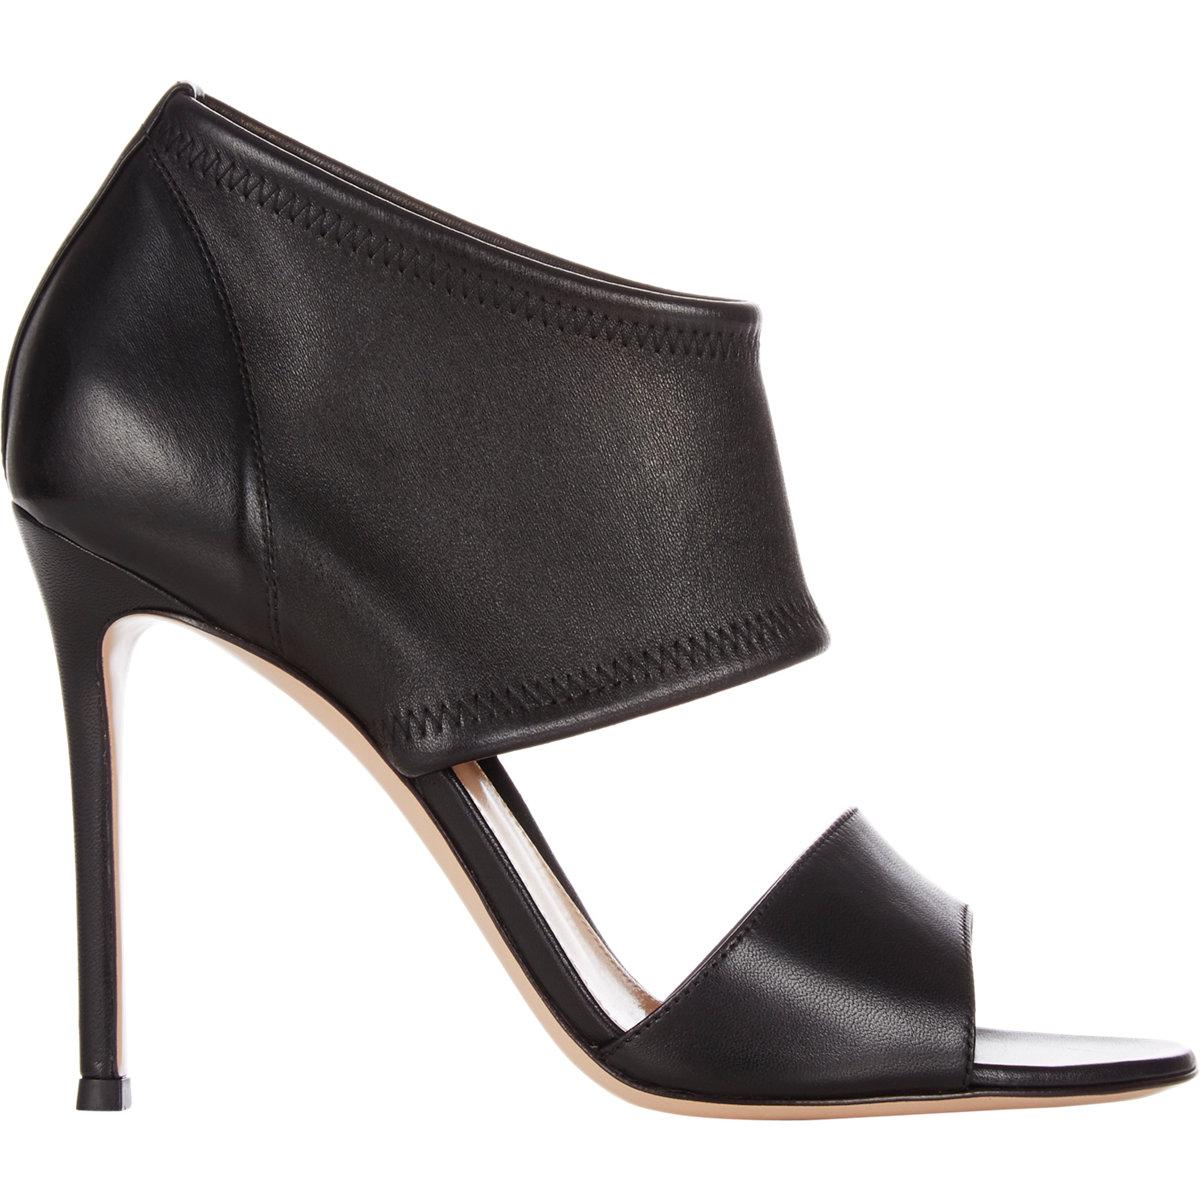 gianvito stretch ankle cuff sandals in black lyst